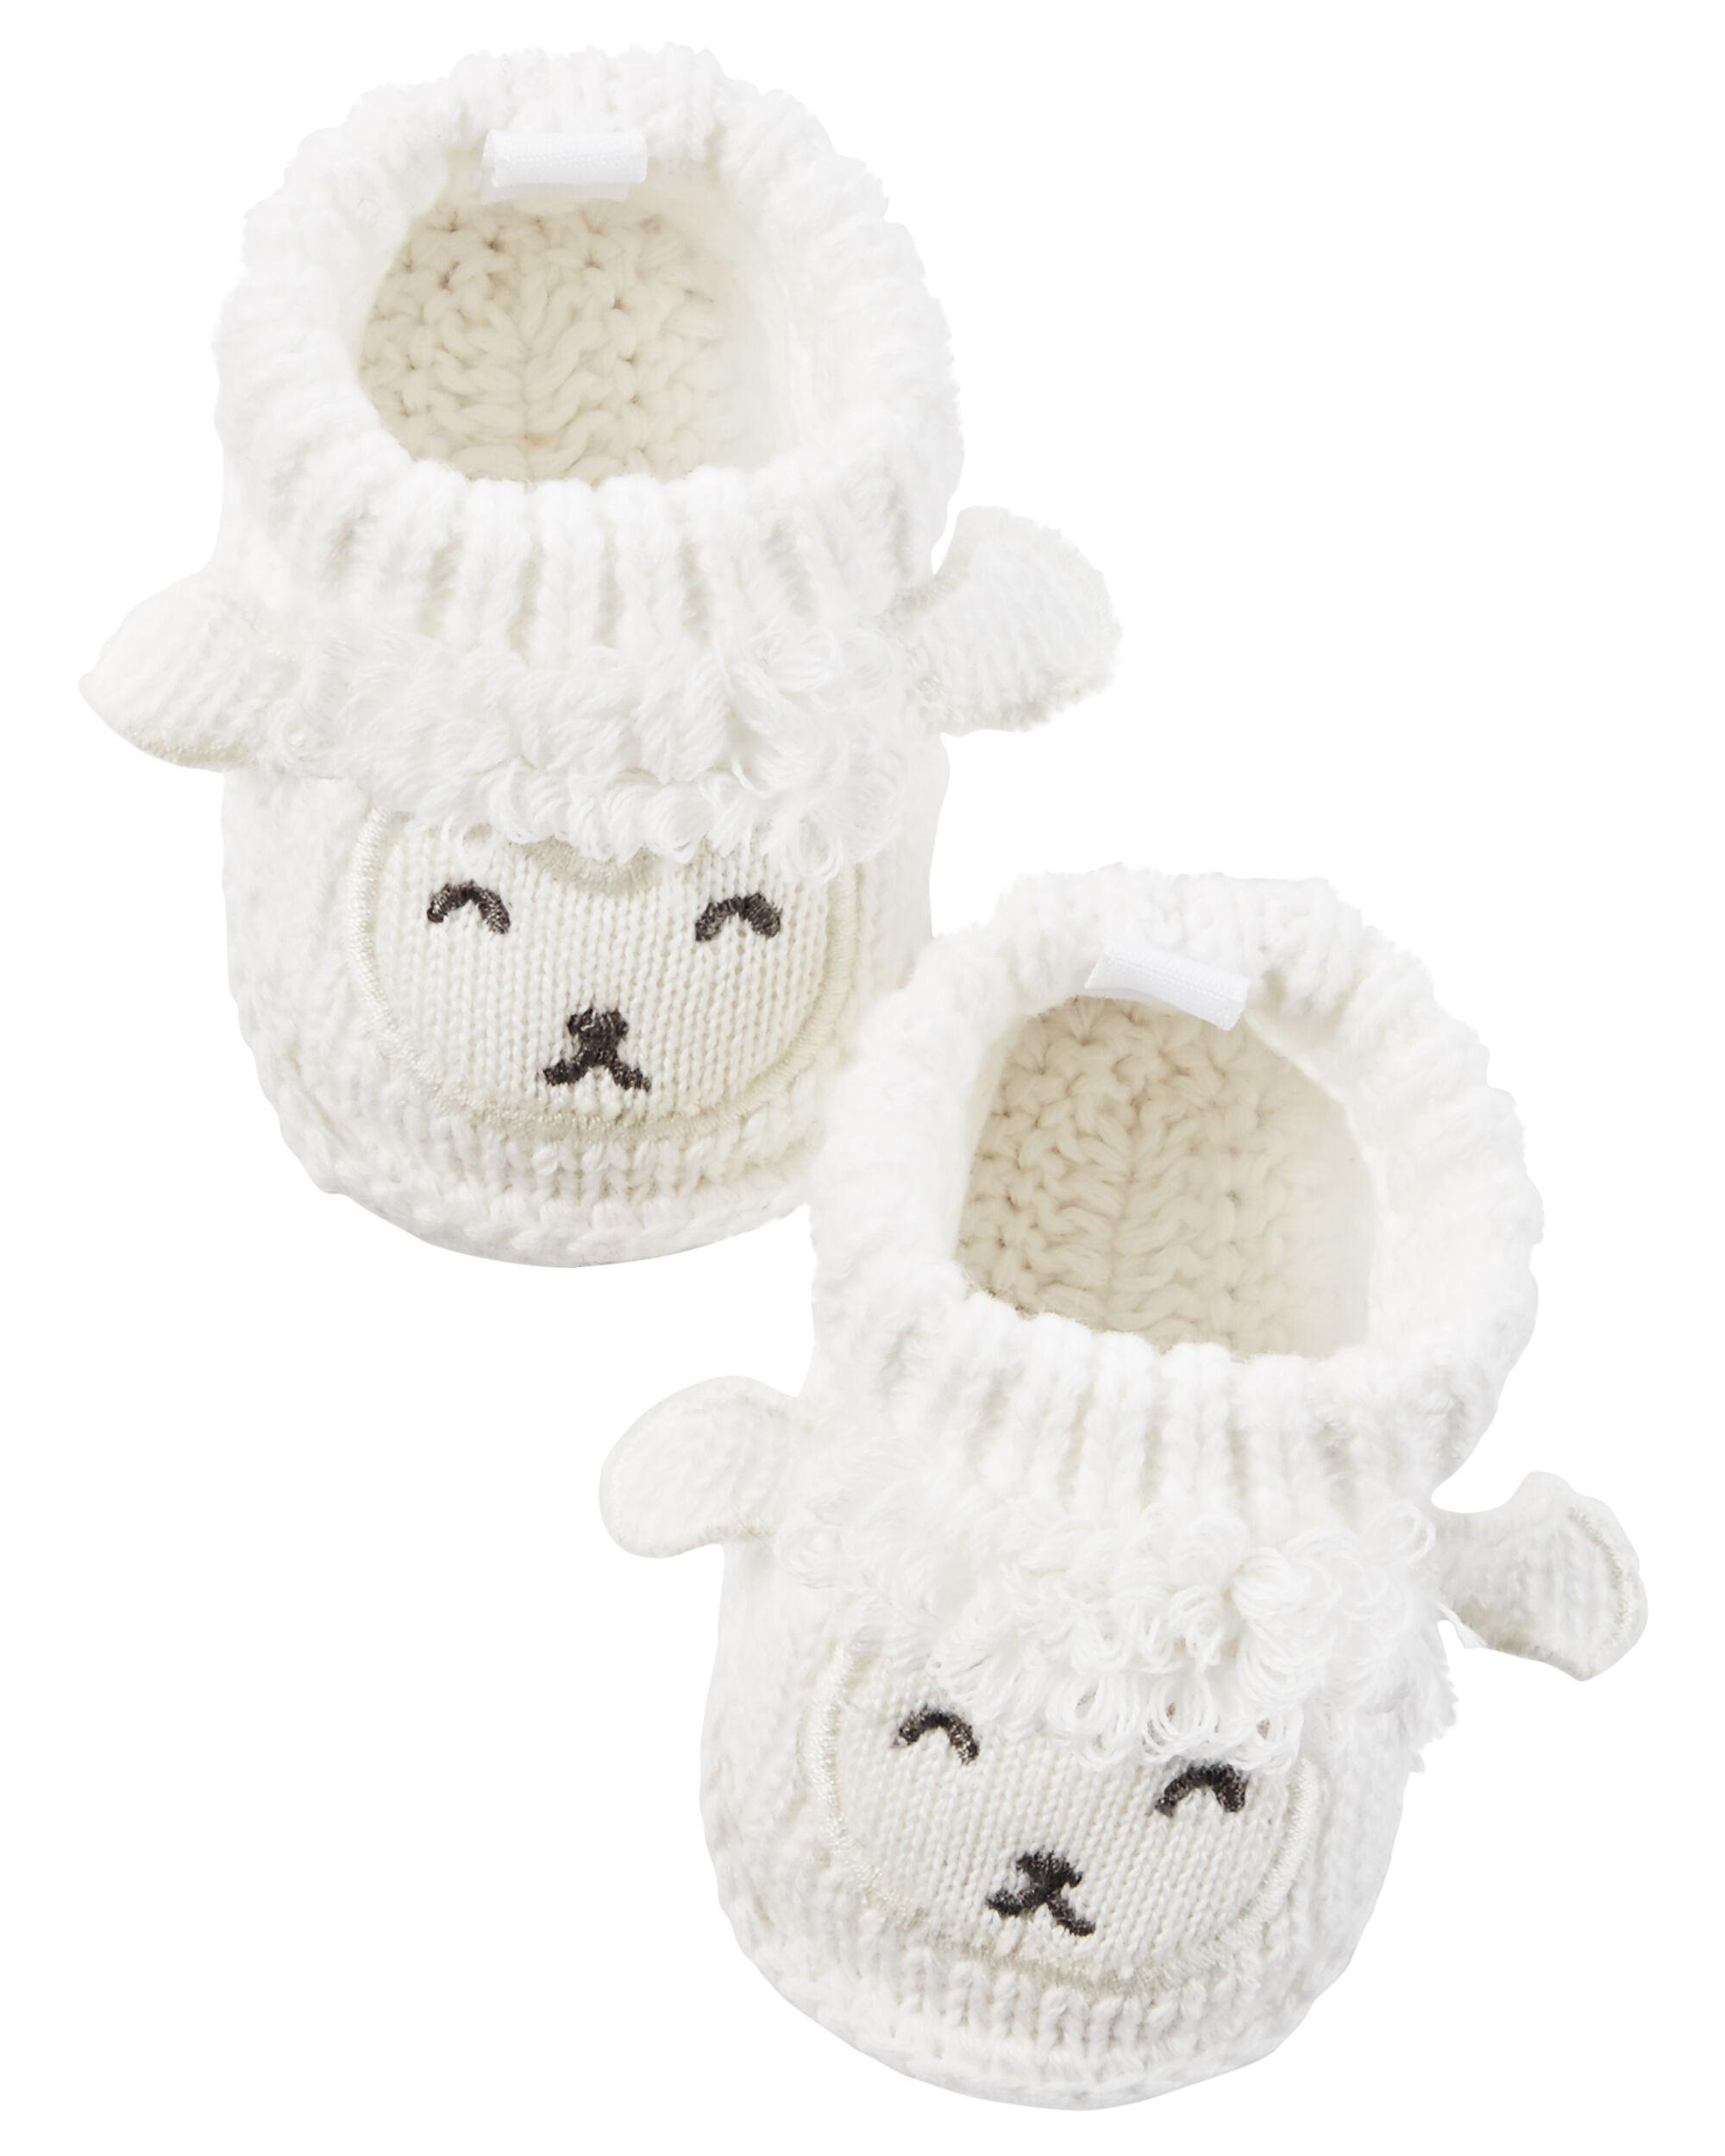 Lamb Crocheted Booties | carters.com